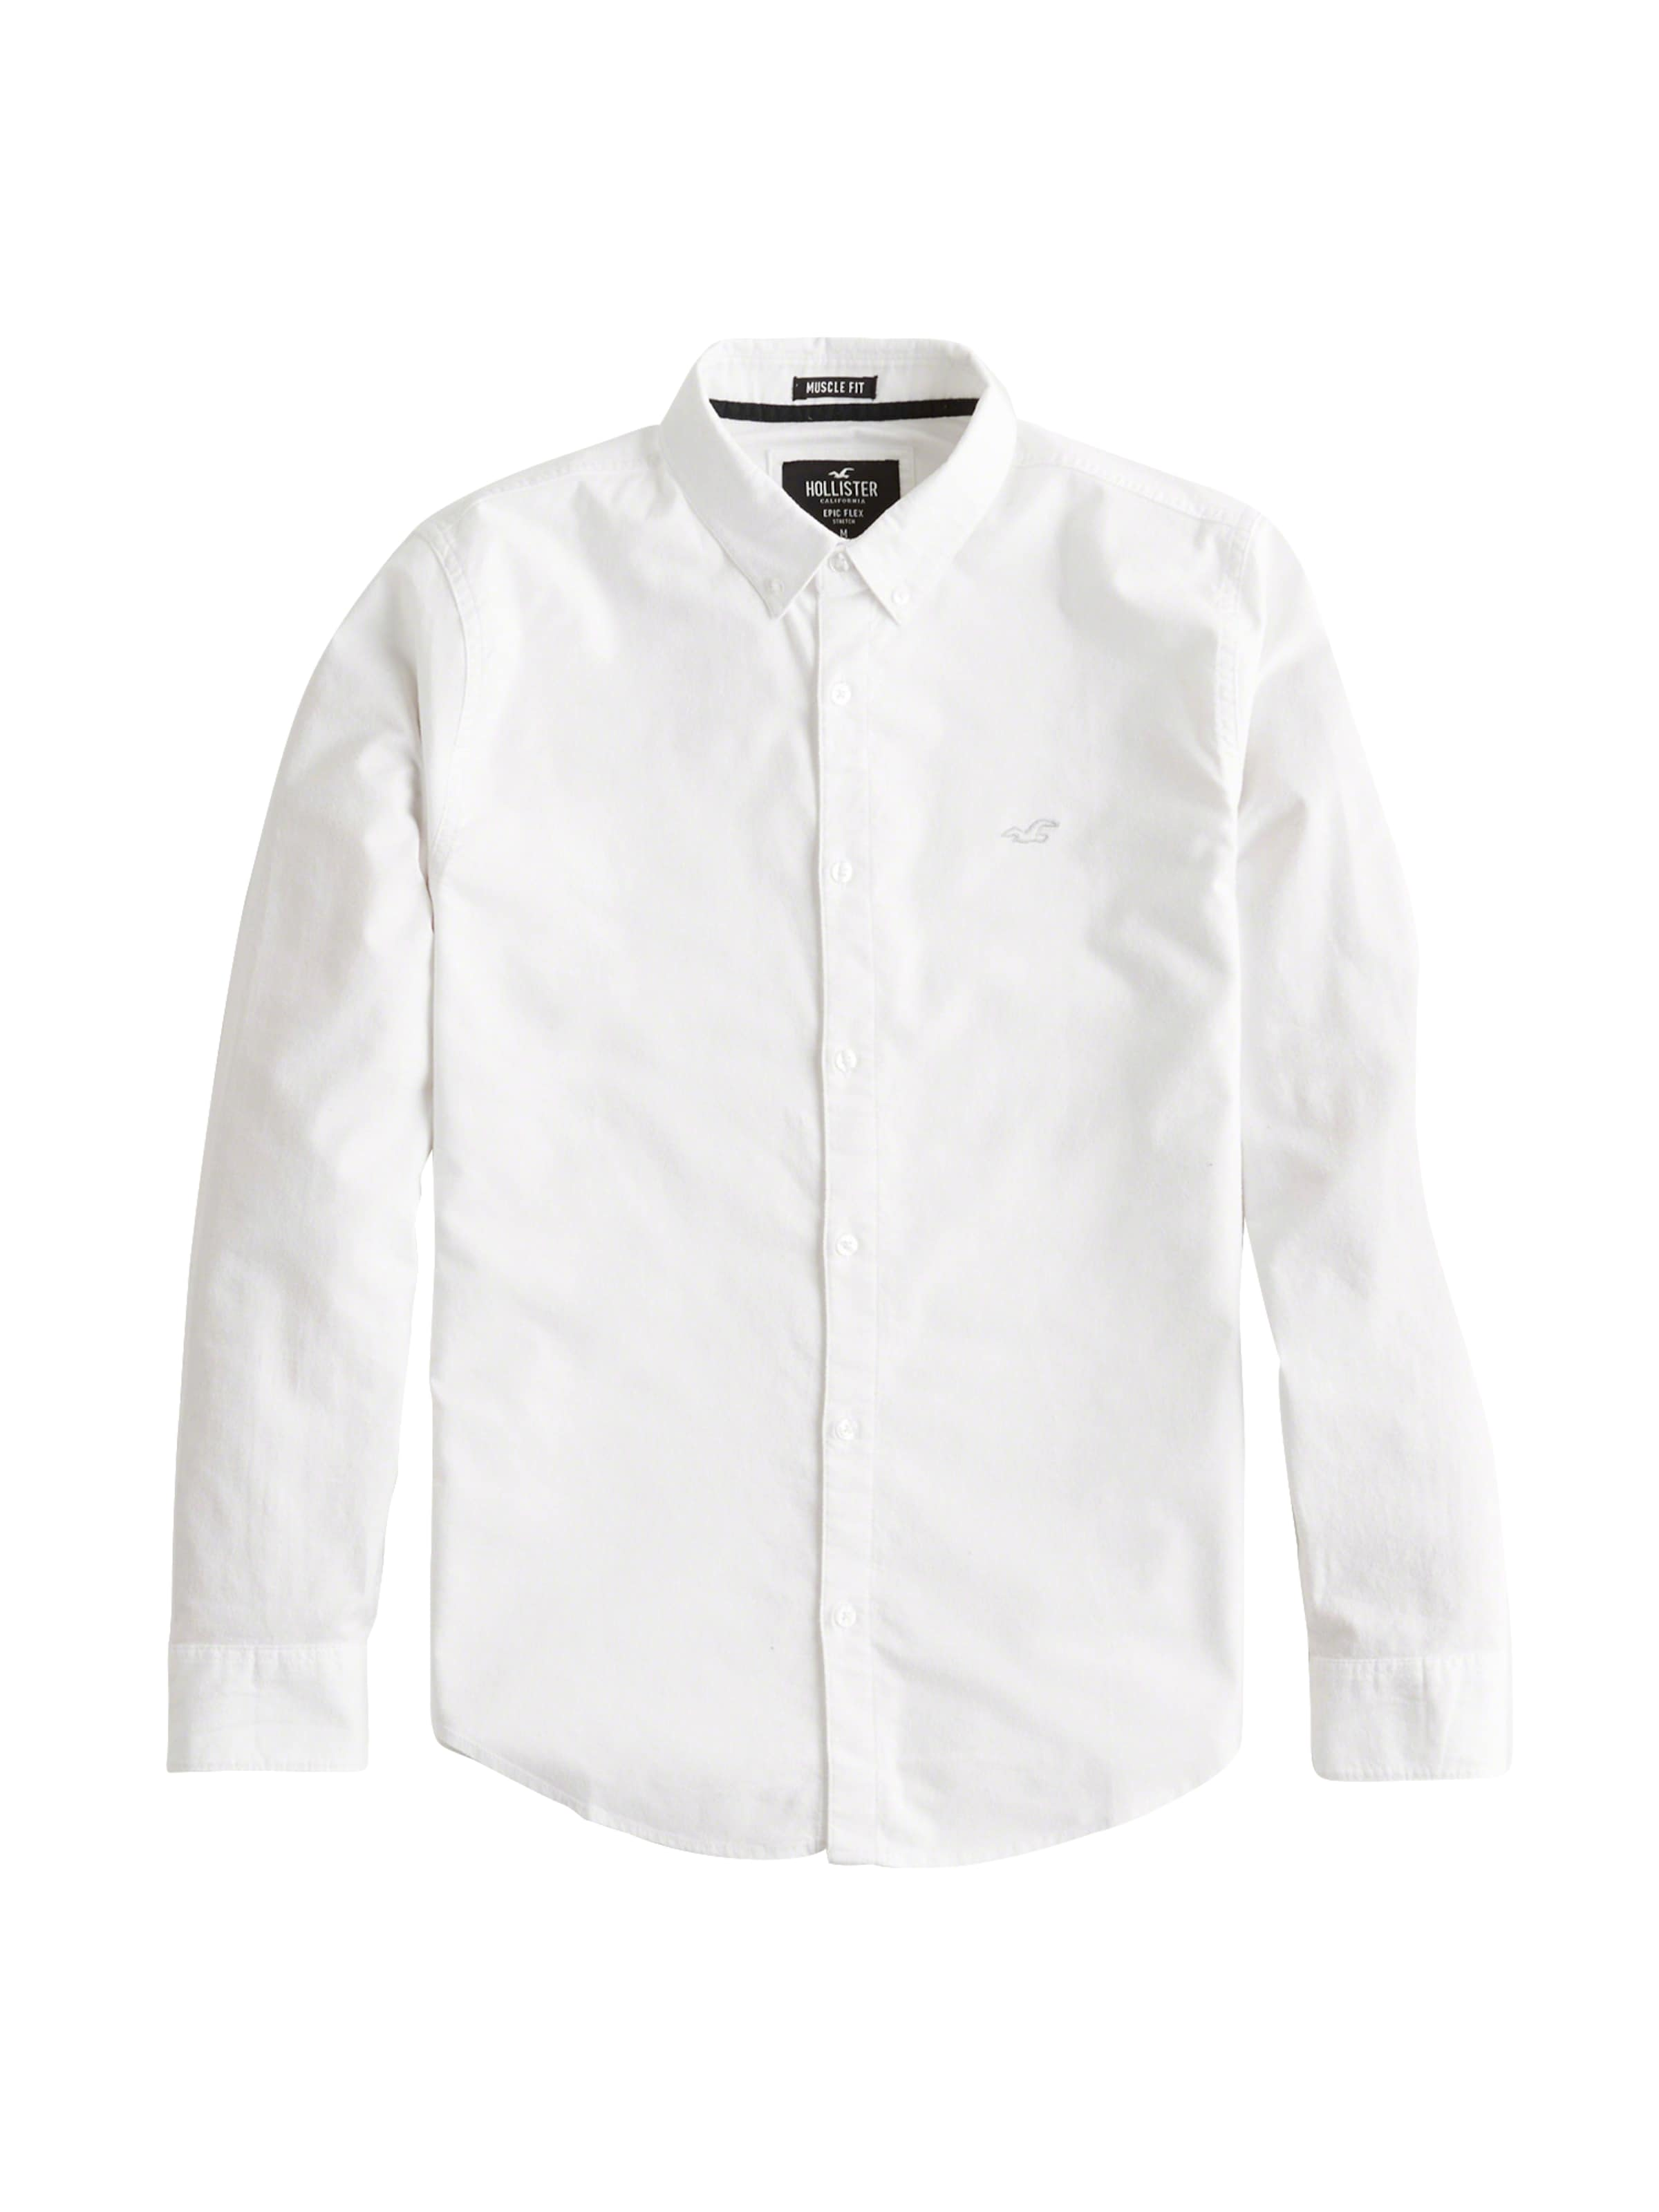 Hollister Chemise Blanc En Chemise Hollister En Blanc f7gb6y